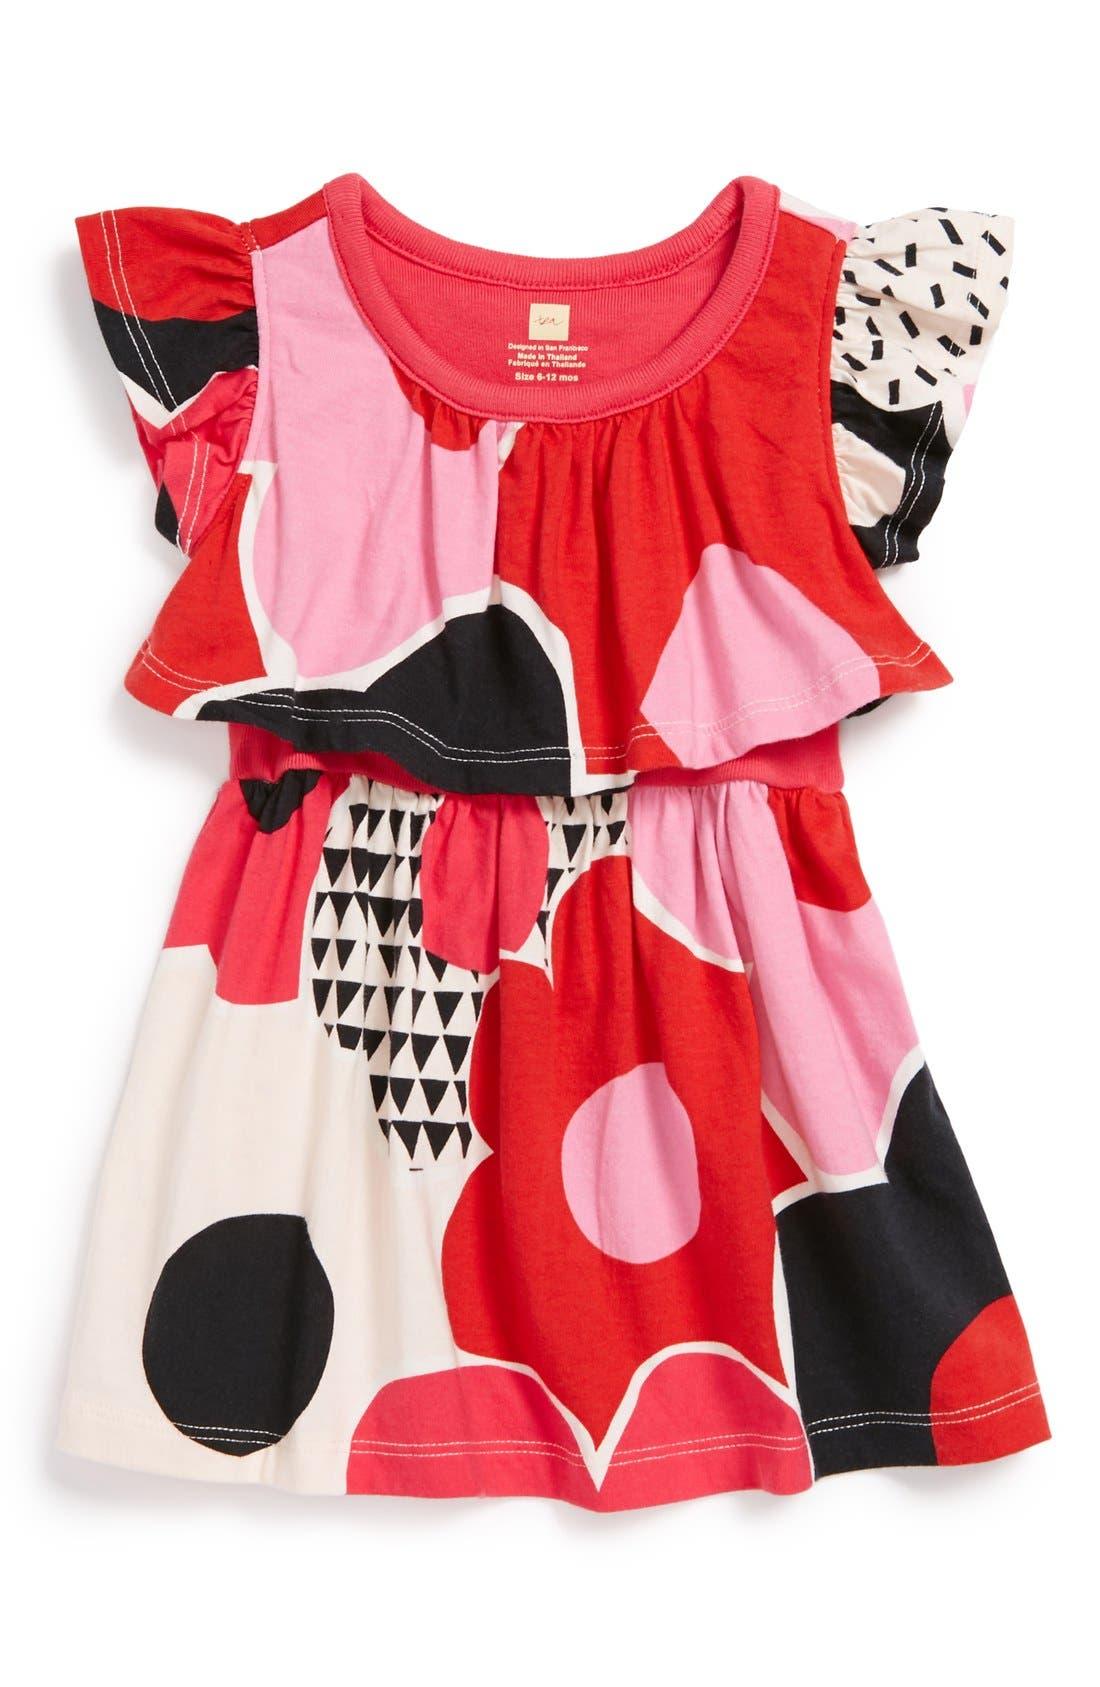 Alternate Image 1 Selected - Tea Collection 'Mod Medina' Play Dress (Baby Girls)